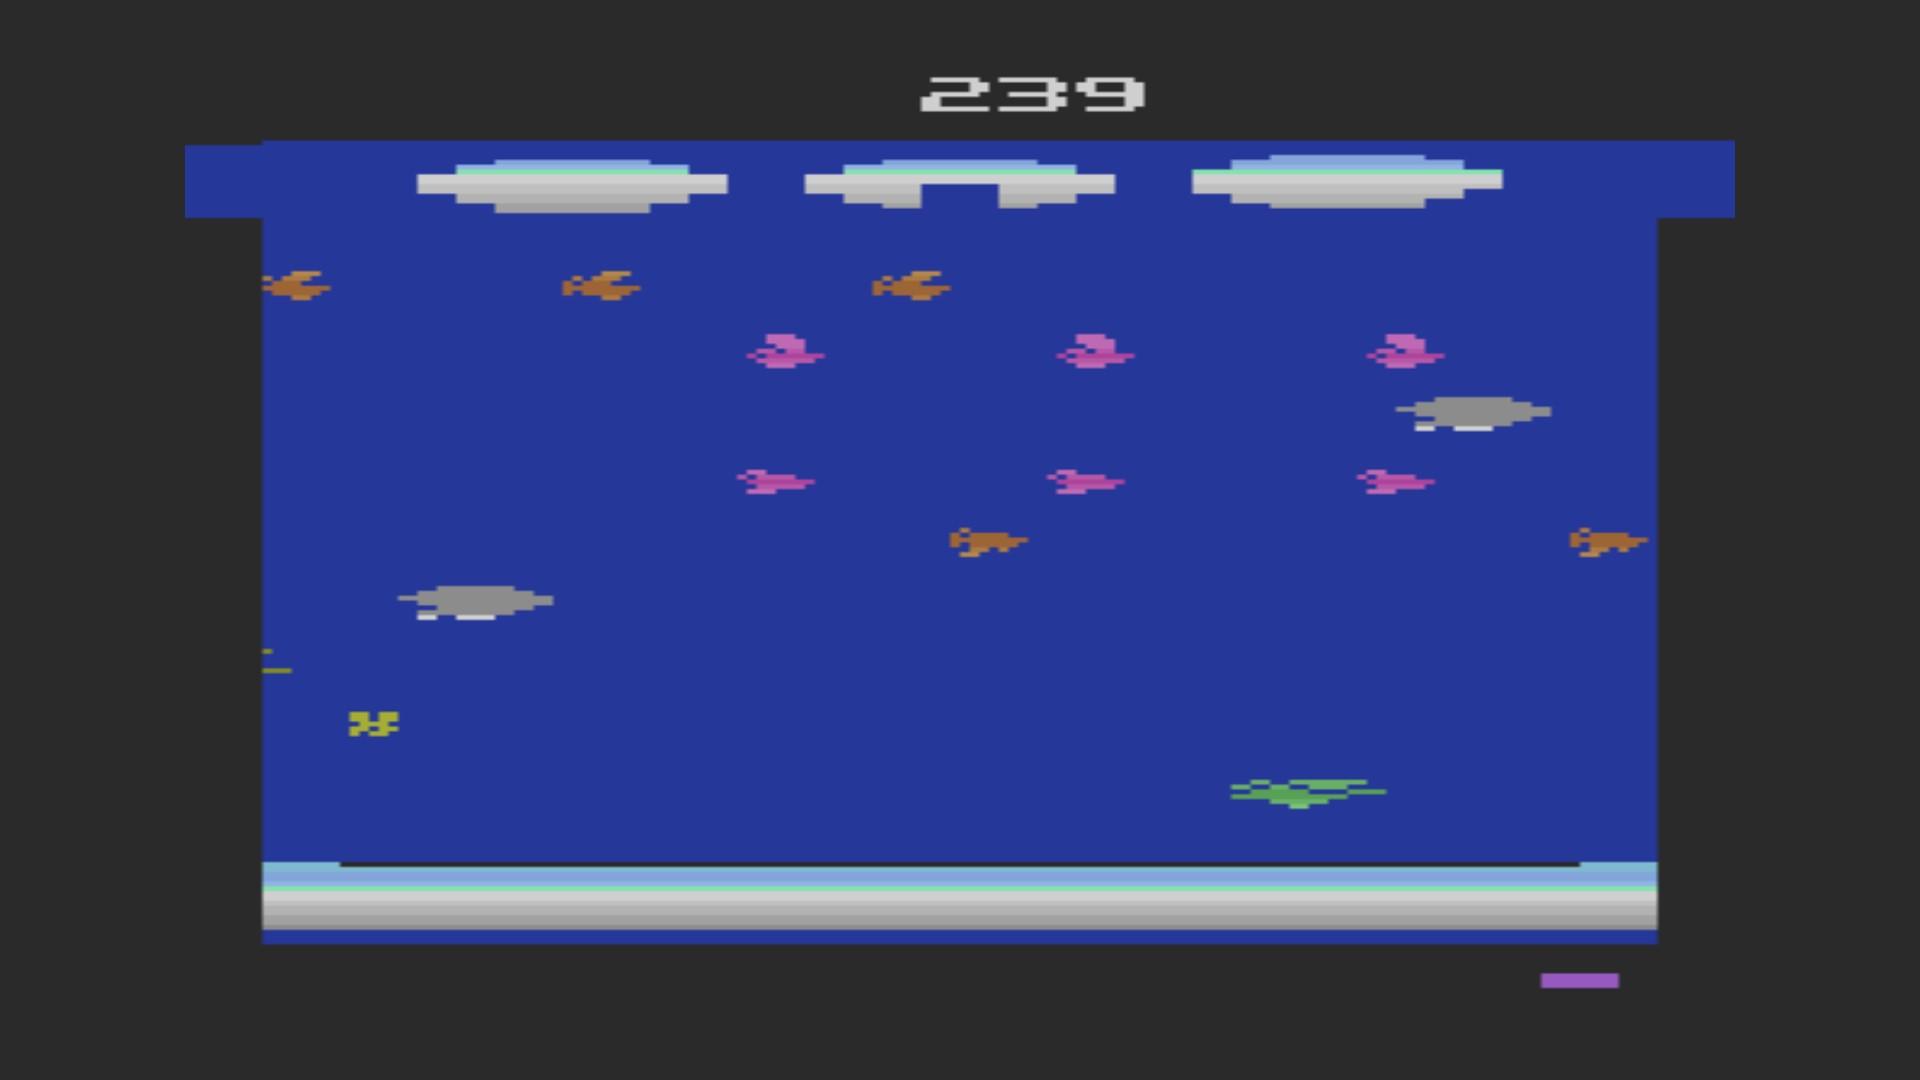 AkinNahtanoj: Frogger II: Threedeep (Atari 2600 Emulated Novice/B Mode) 239 points on 2020-08-26 03:11:09